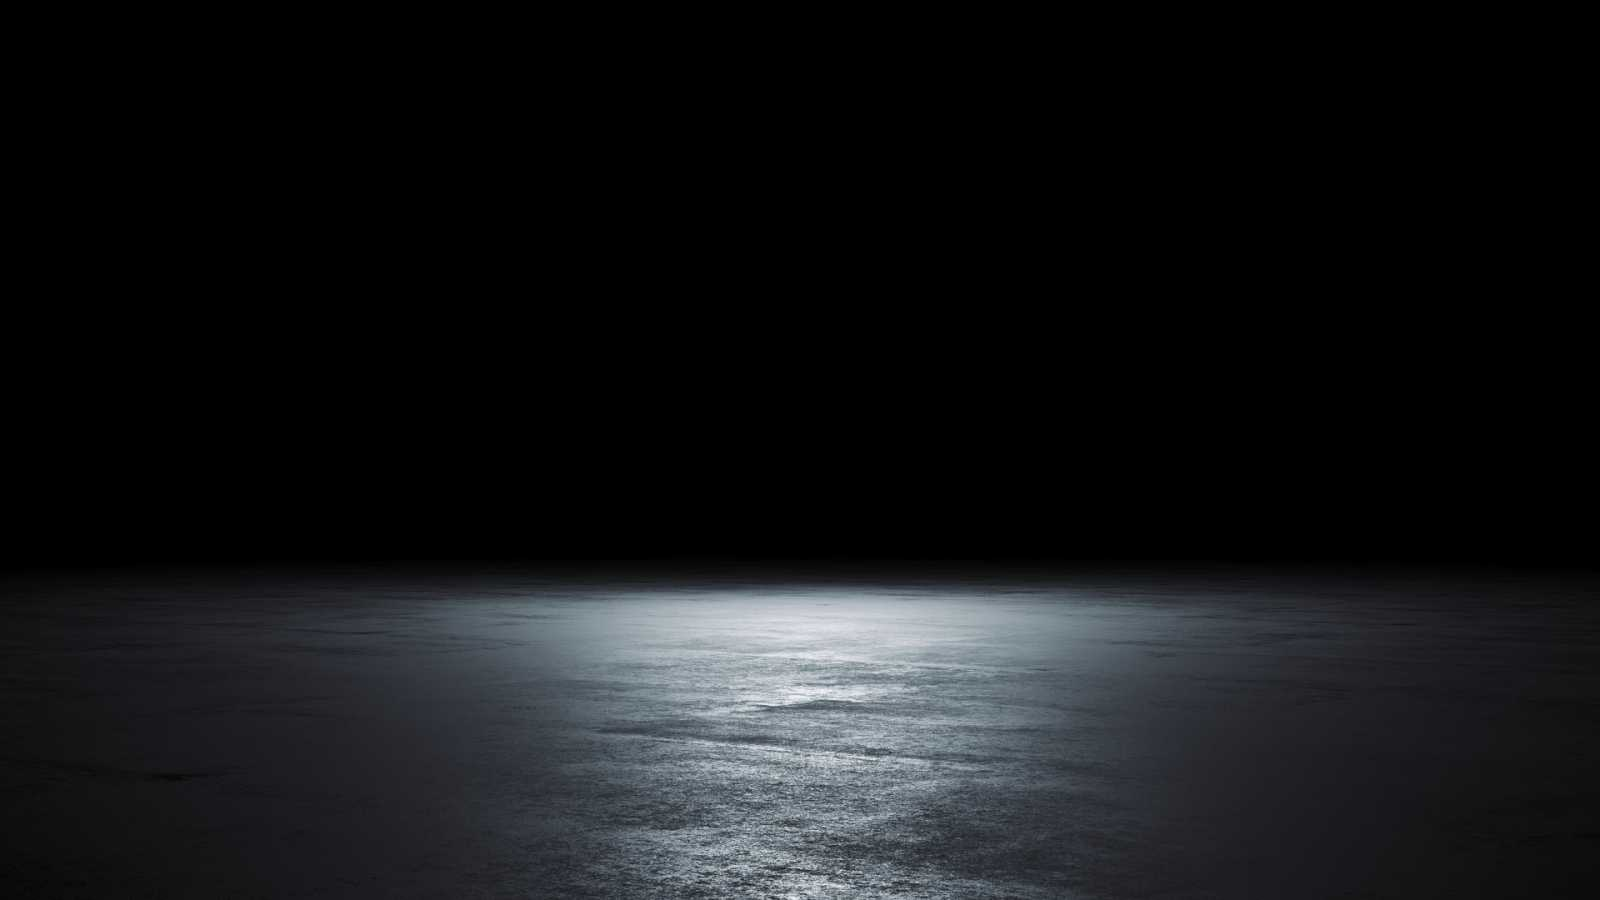 Materia oscura y agujeros negros - Escuchar ahora